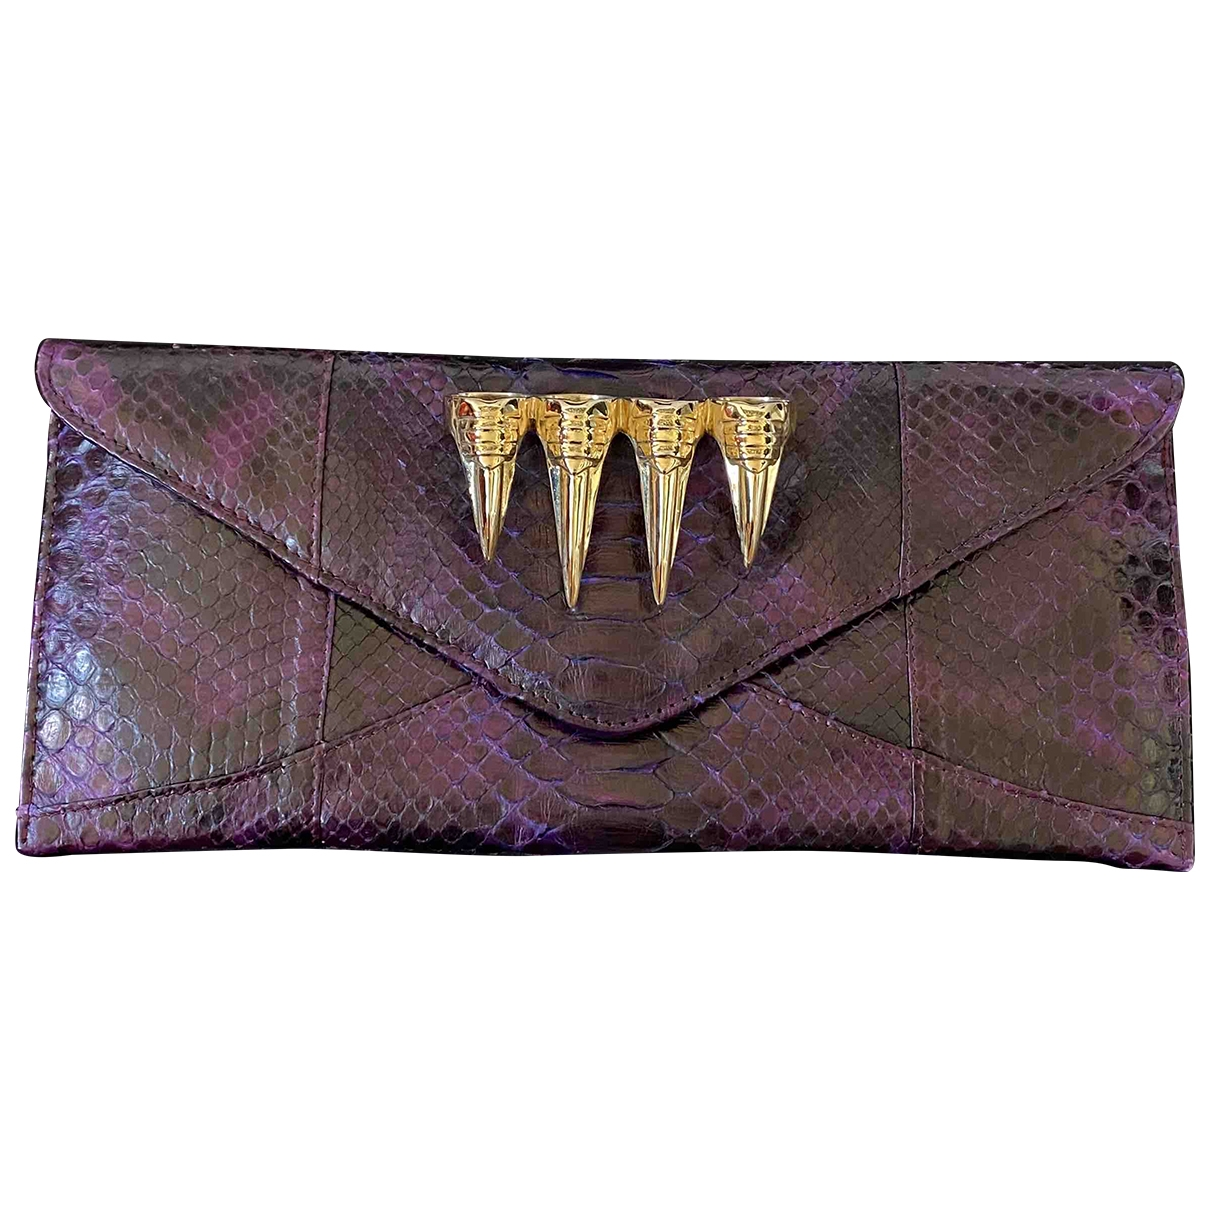 Maison Du Posh \N Purple Python Clutch bag for Women \N